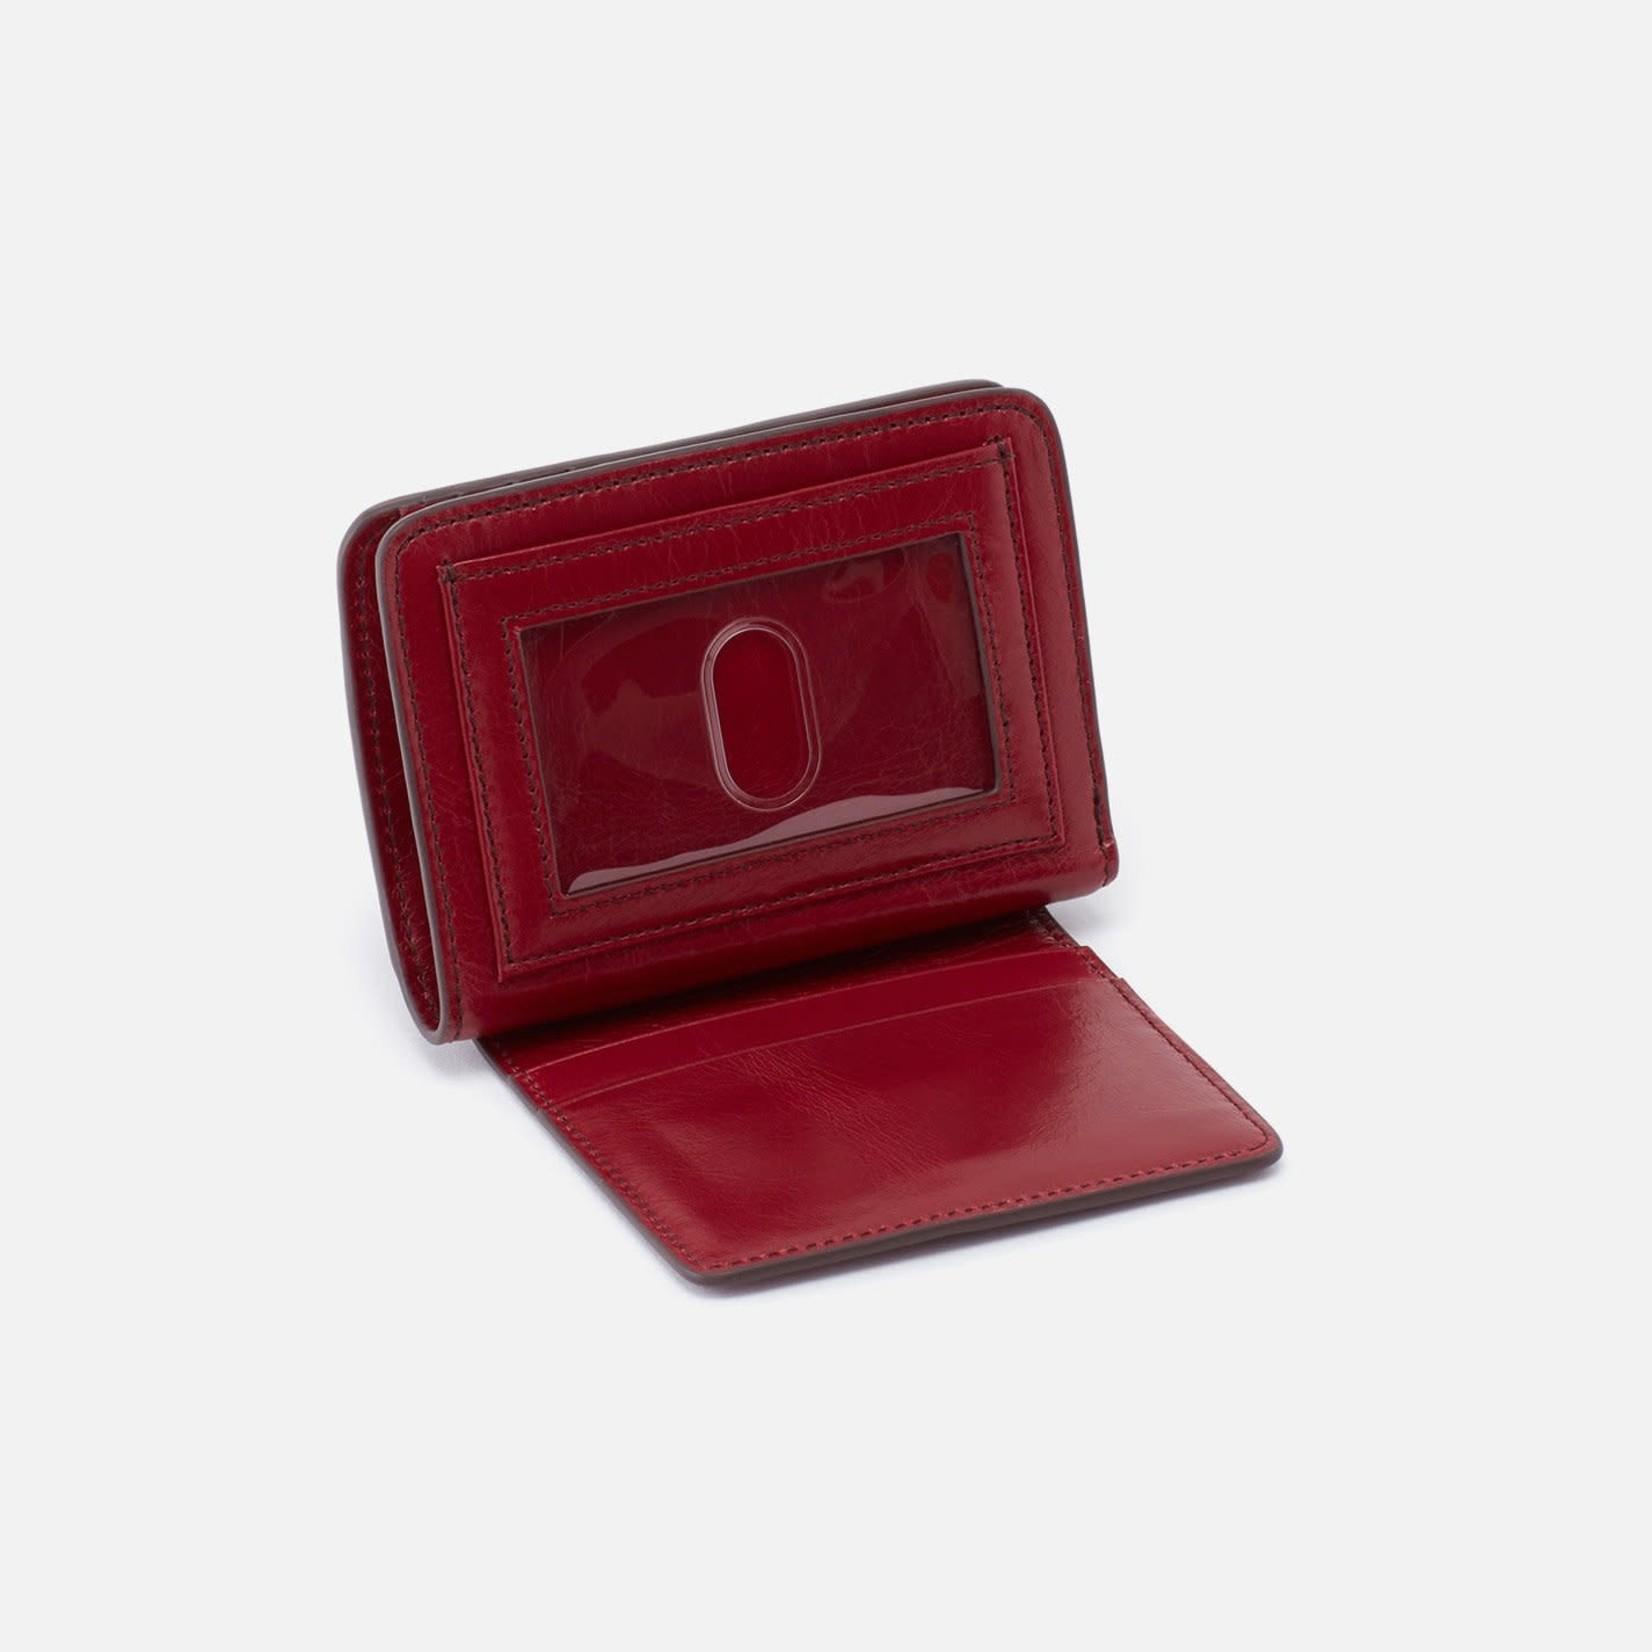 HOBO Vow Cardinal Vintage Hide Leather Wallet